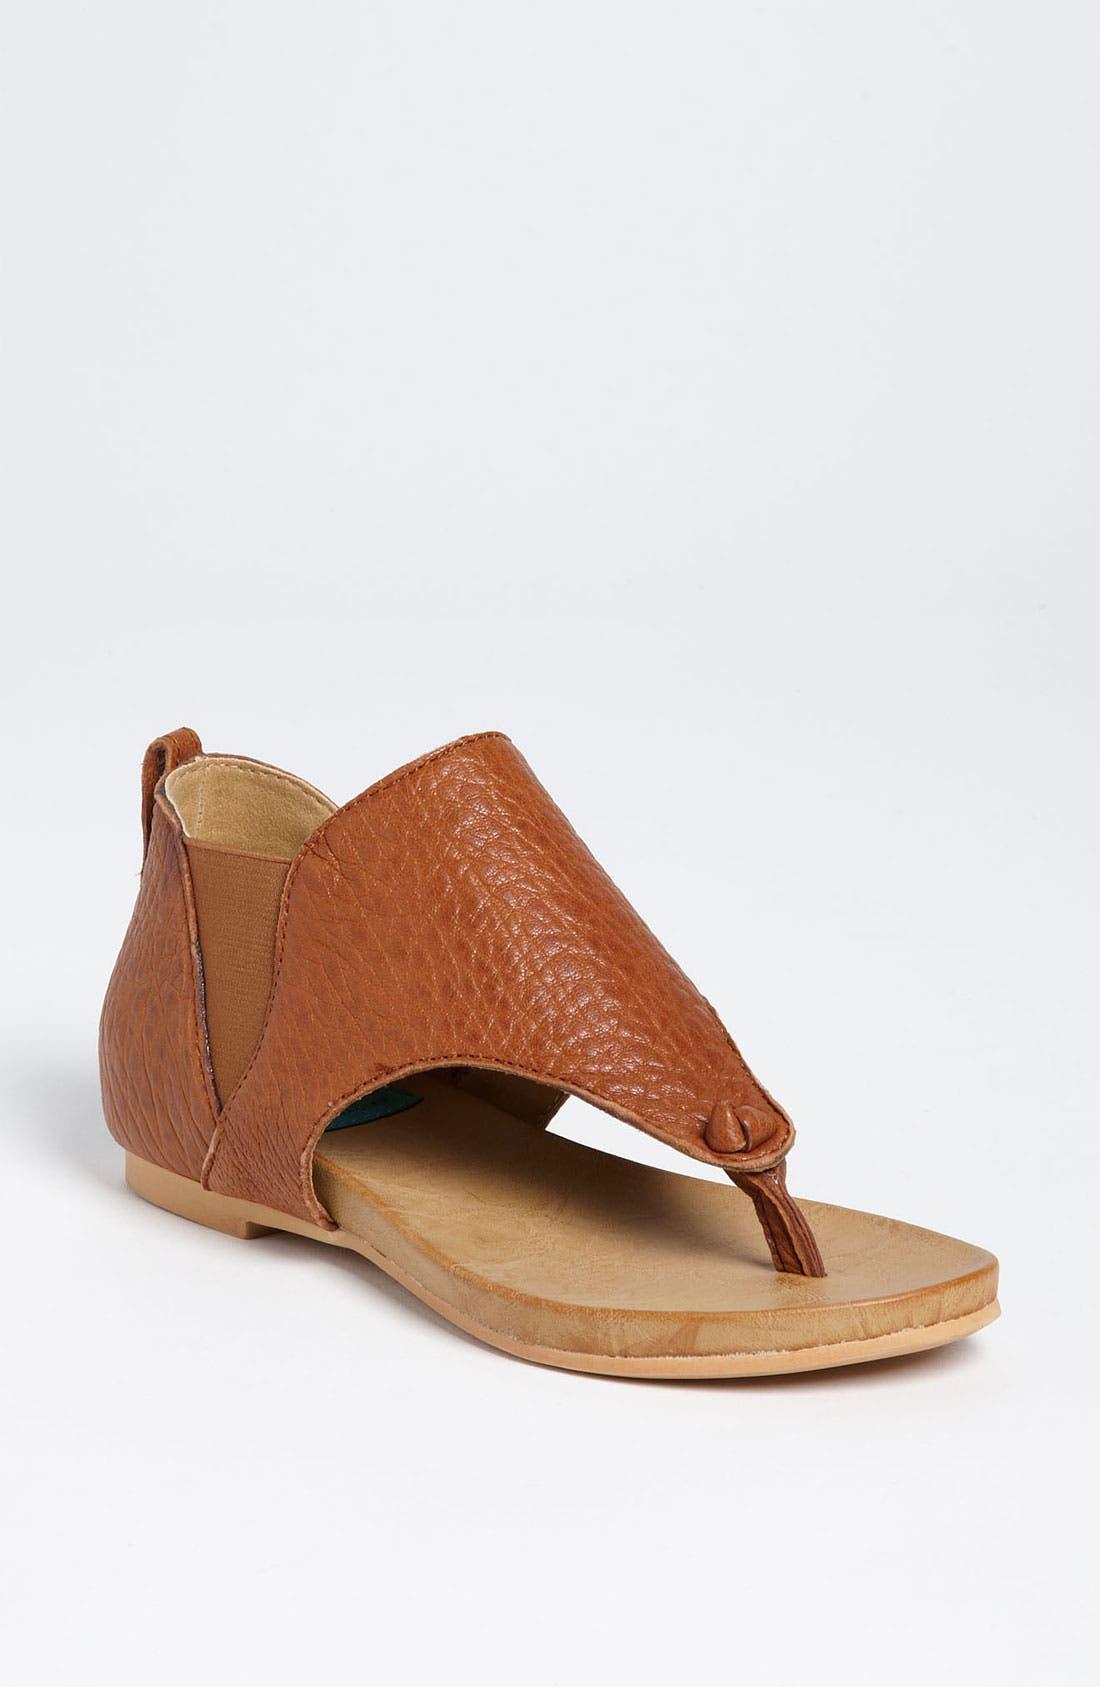 Alternate Image 1 Selected - Fugu Malibu 'Tonga' Sandal